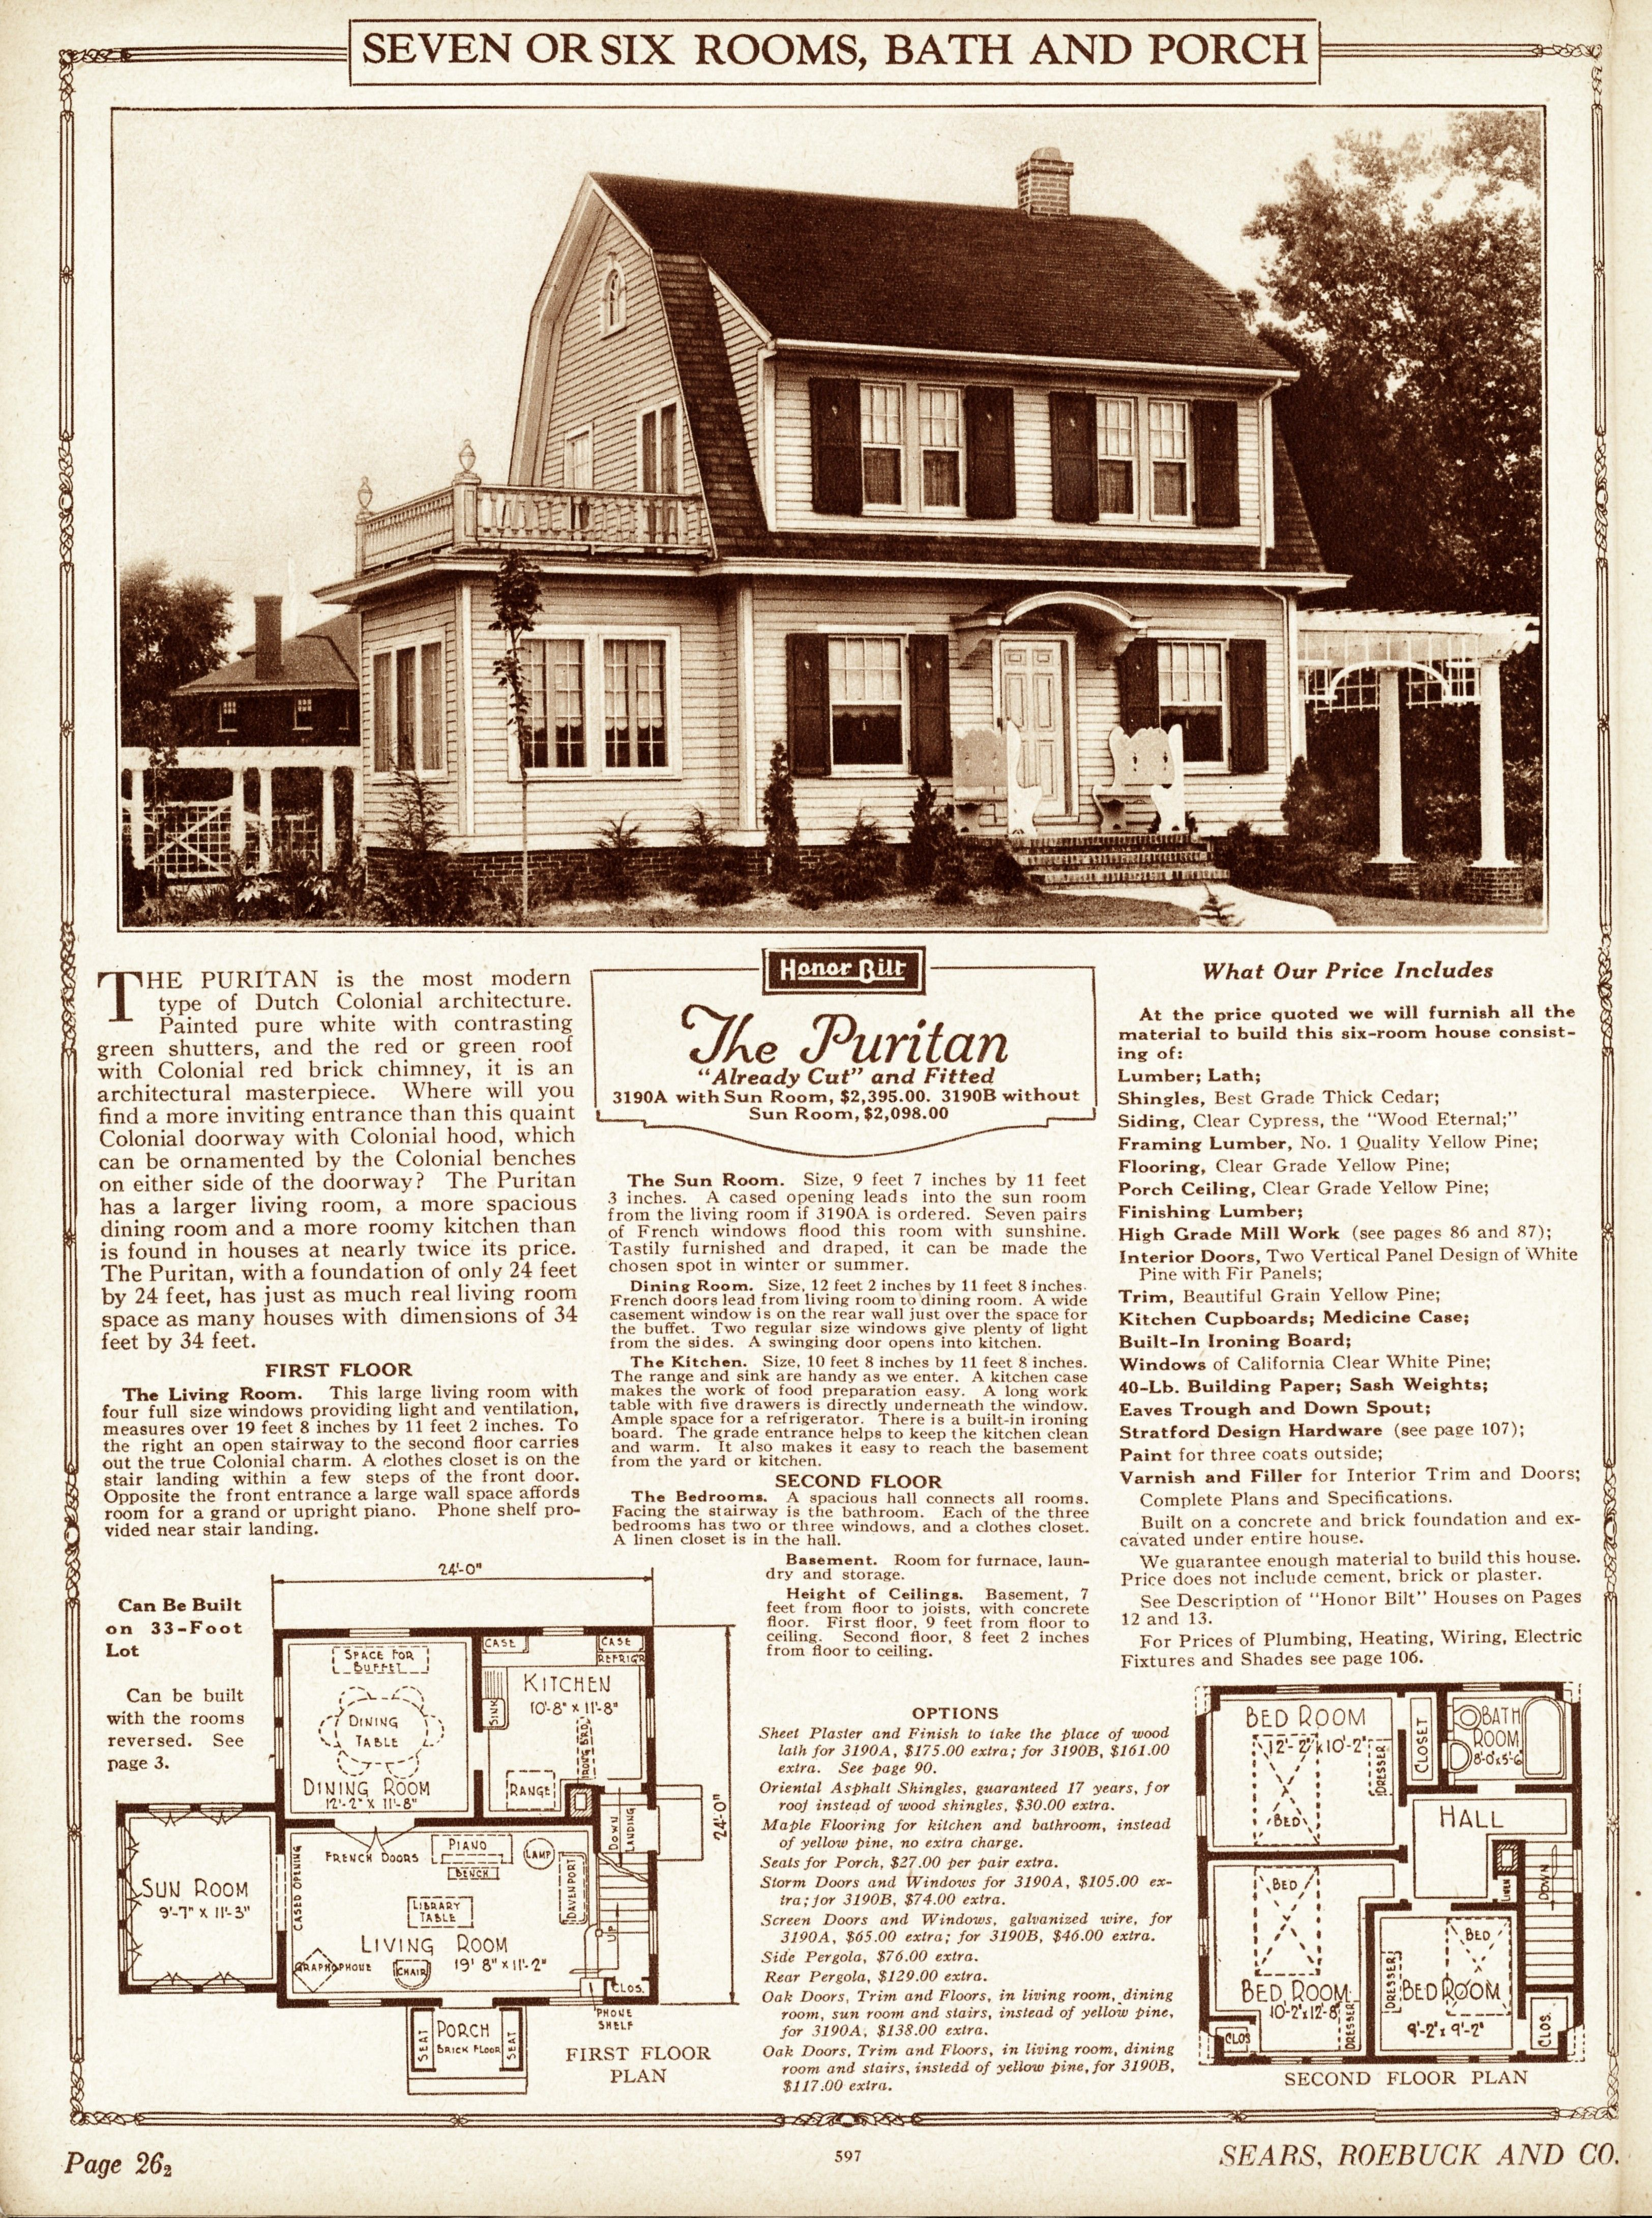 Architecture House Plans Blueprints And Cosntruction Documents Site Www Thejonathanalonso Com J Vintage House Plans Dutch Colonial Dutch Colonial Homes